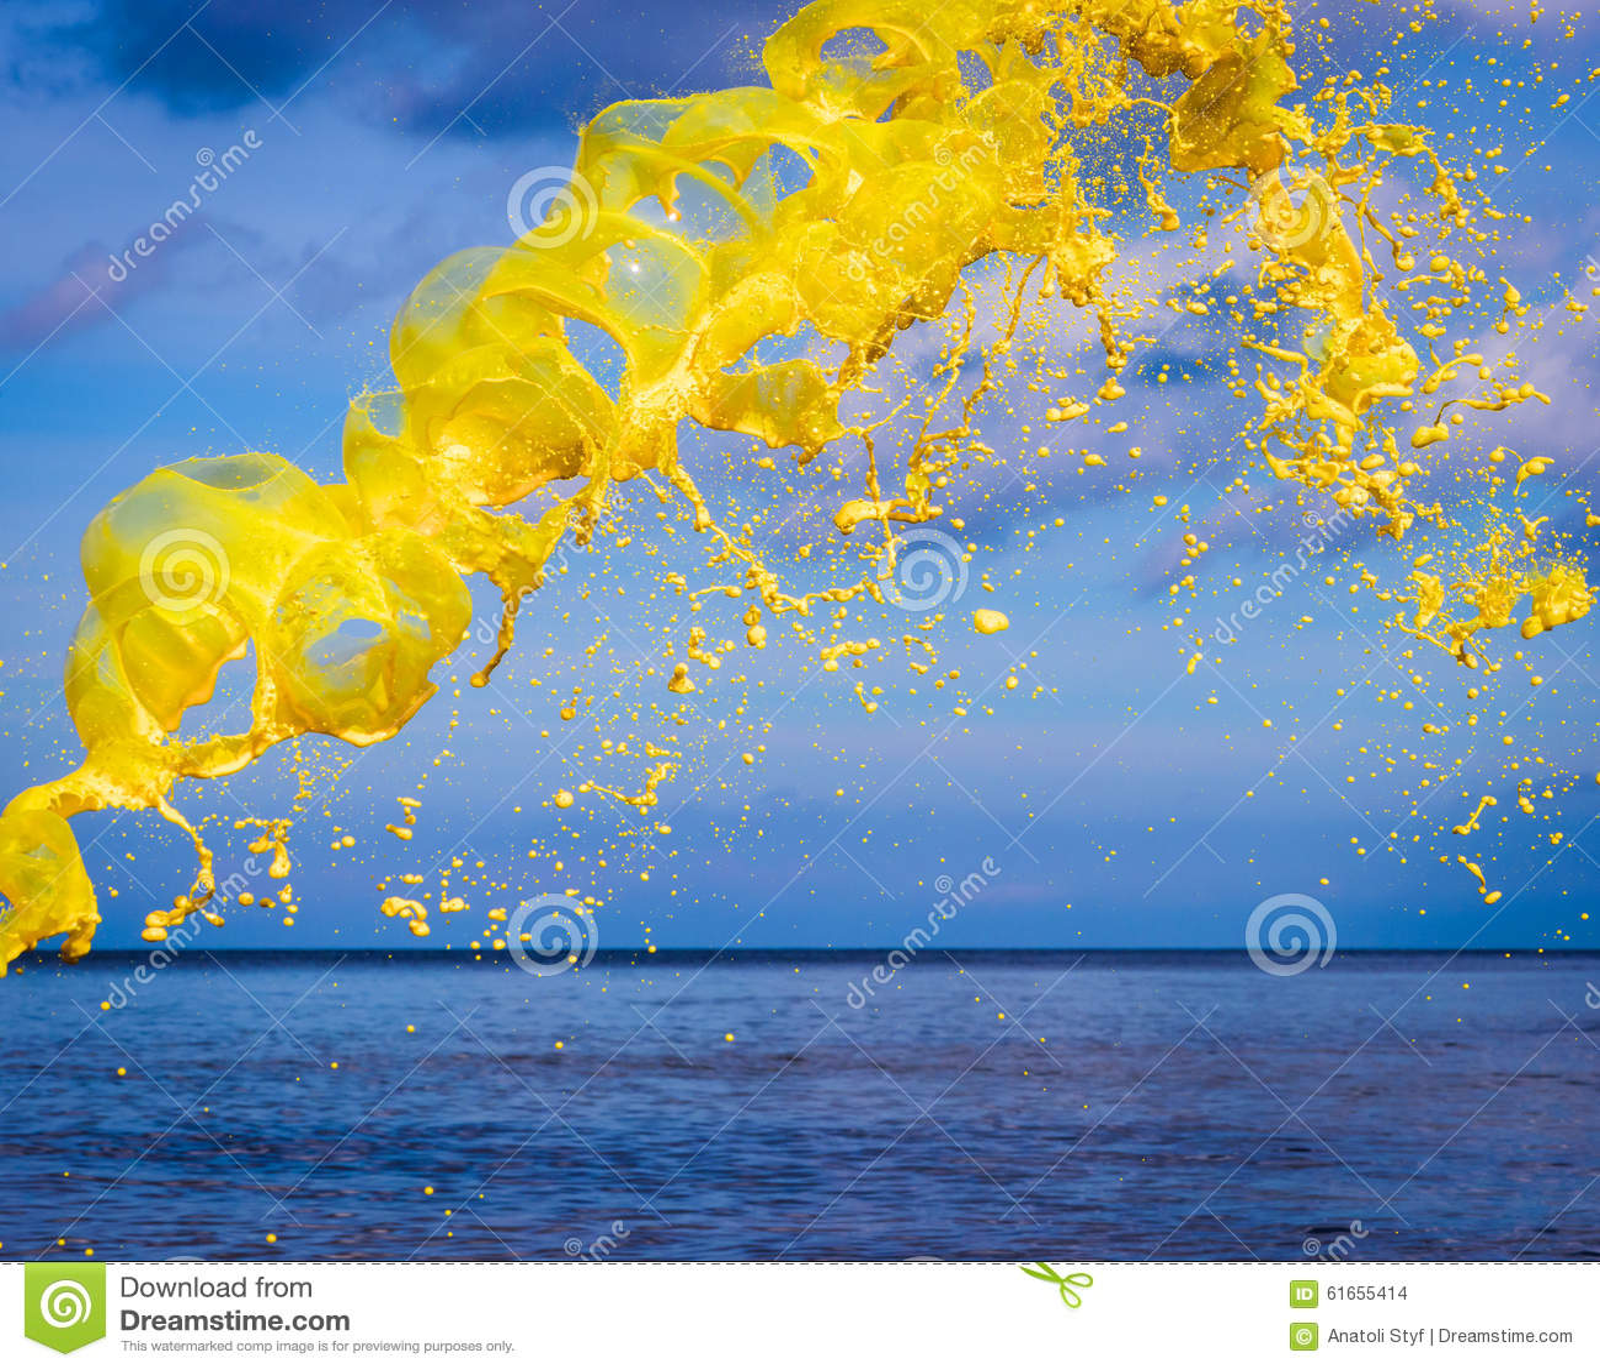 Yellow watercolour splash